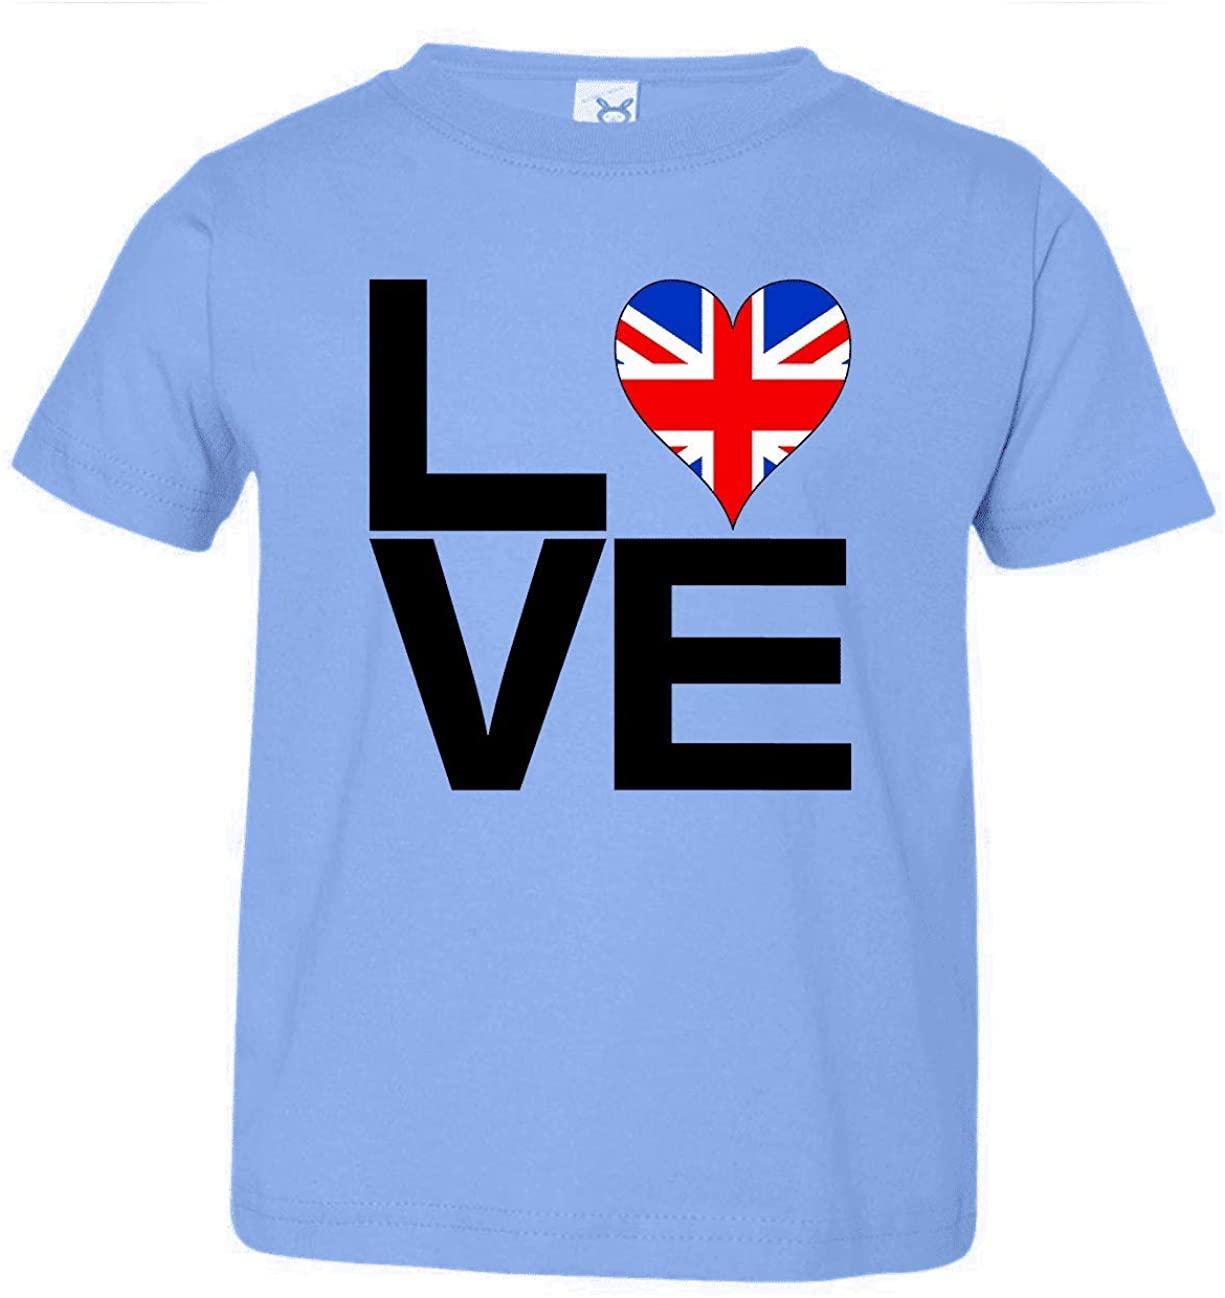 HARD EDGE DESIGN Toddler's Love Block United Kingdom Heart T-Shirt, 2T, Carolina Blue